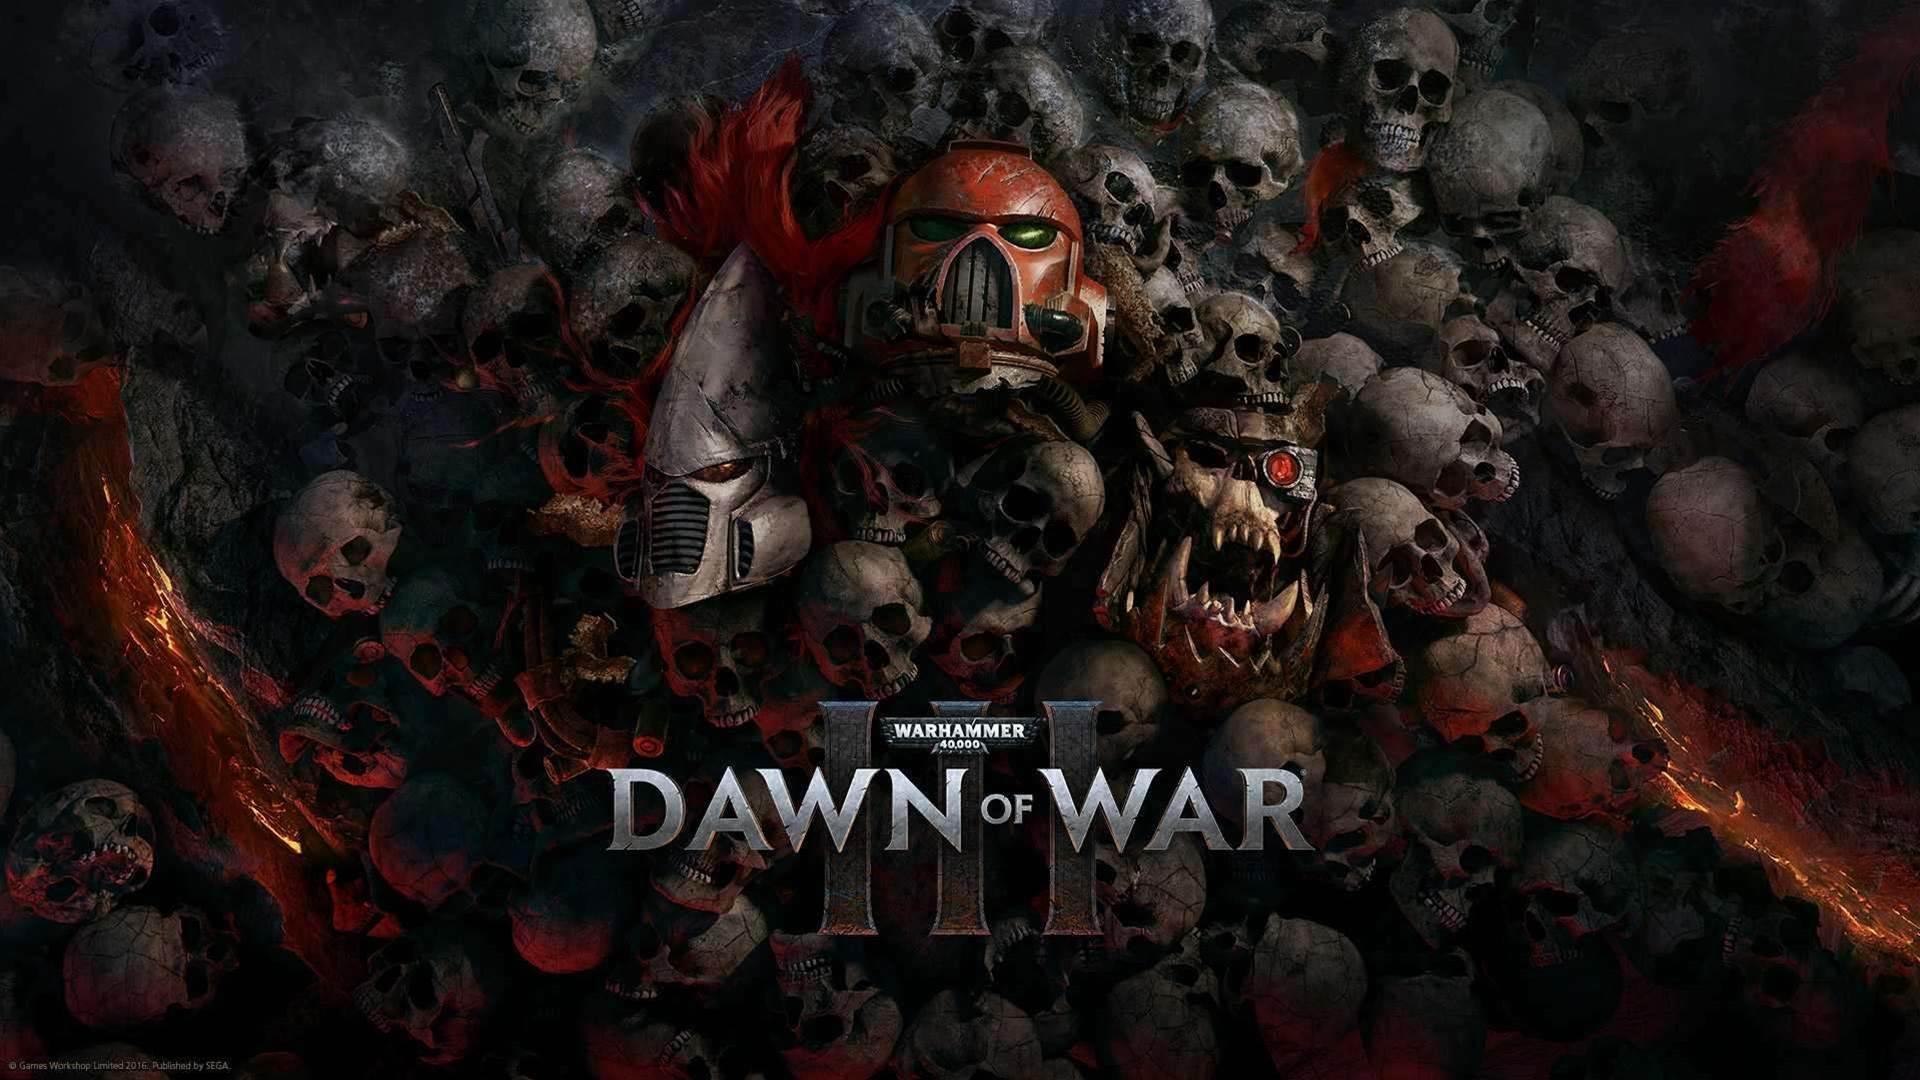 E3 2016 - Warhammer 40,000: Dawn of War 3 screens